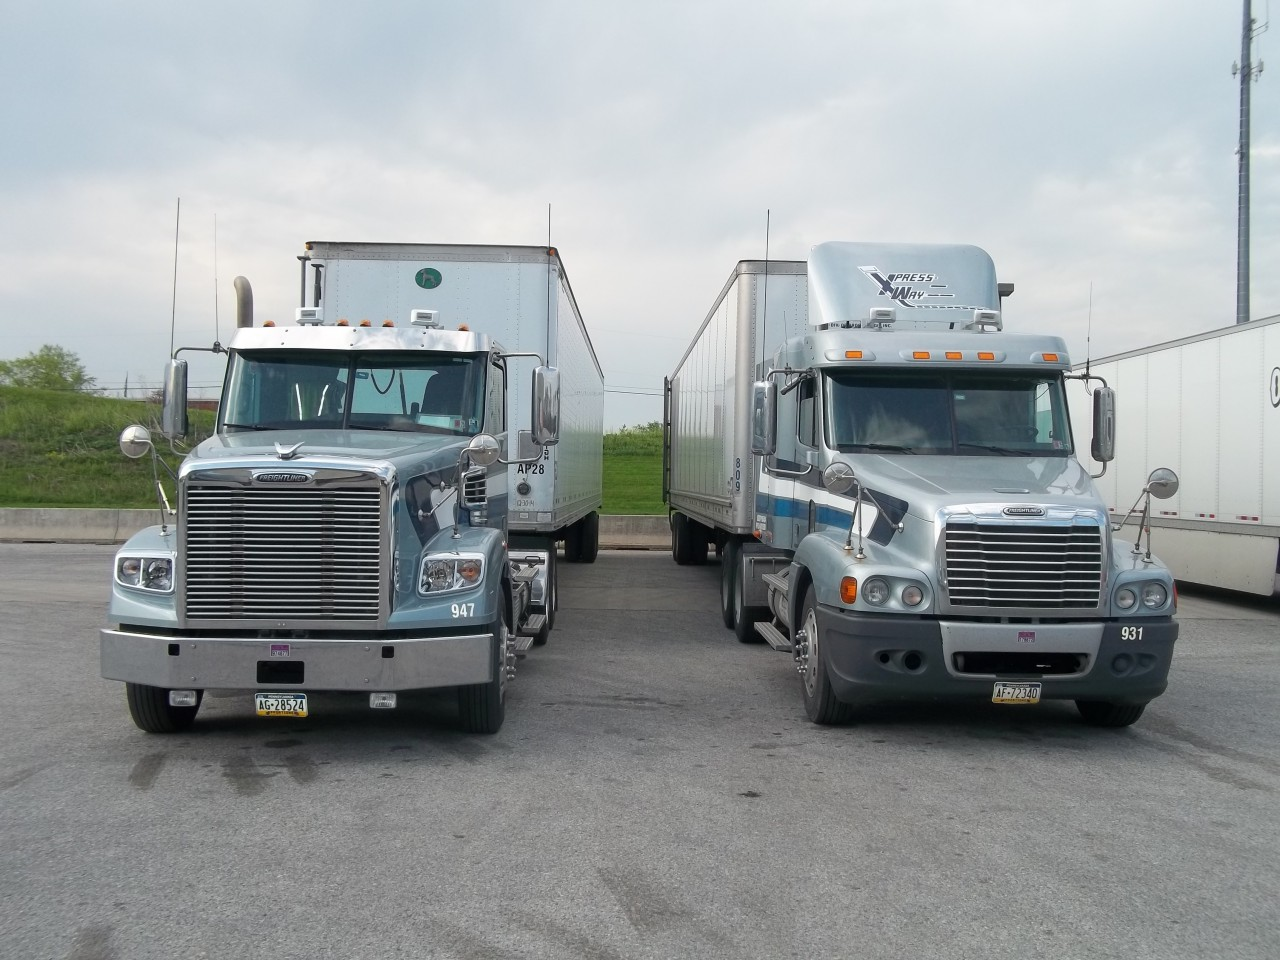 Dualing trucks